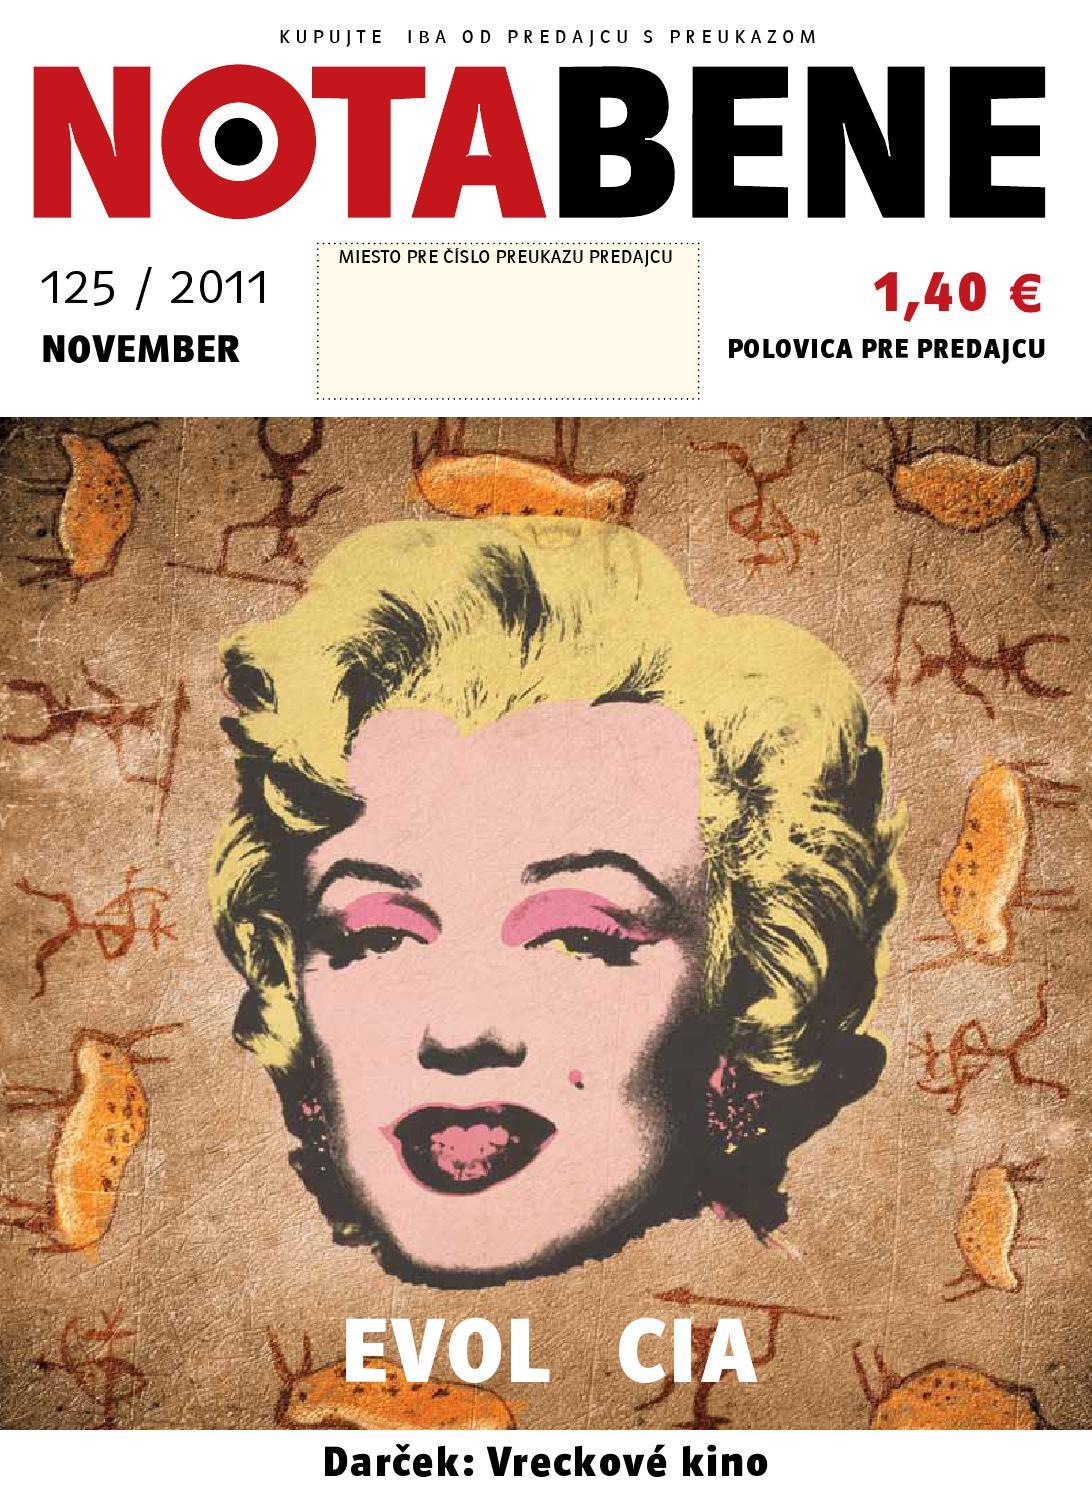 7f421d6788a0d Nota bene 125 november 2011 by Proti prudu - issuu